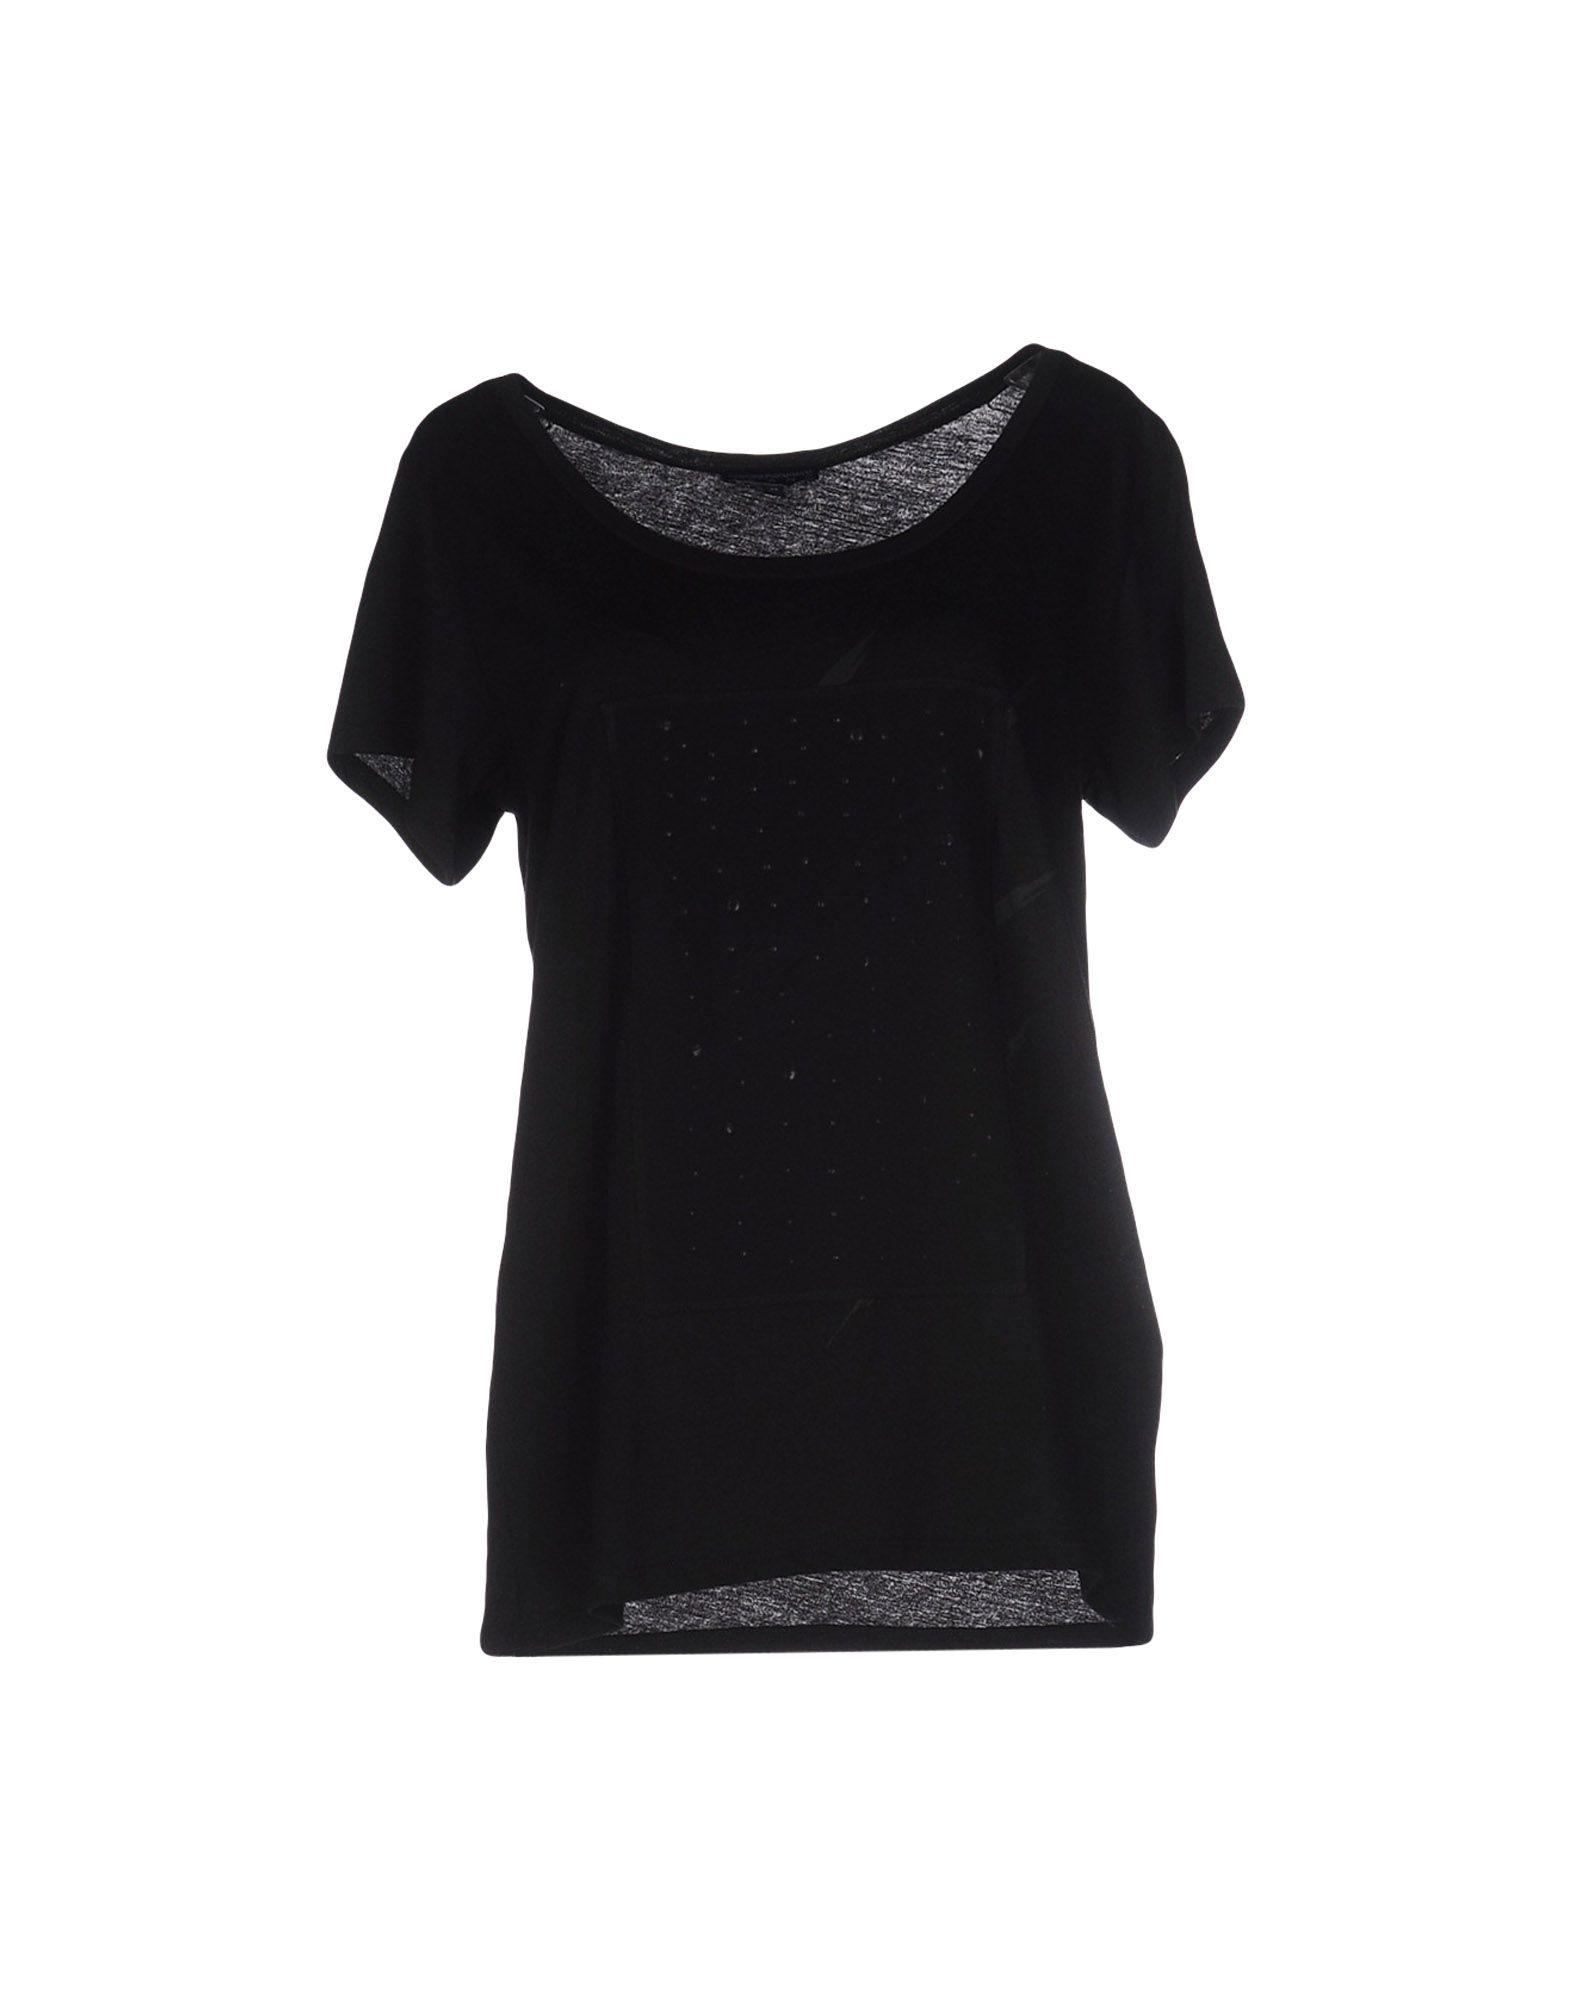 Emporio armani t shirt in black lyst for Black armani t shirt